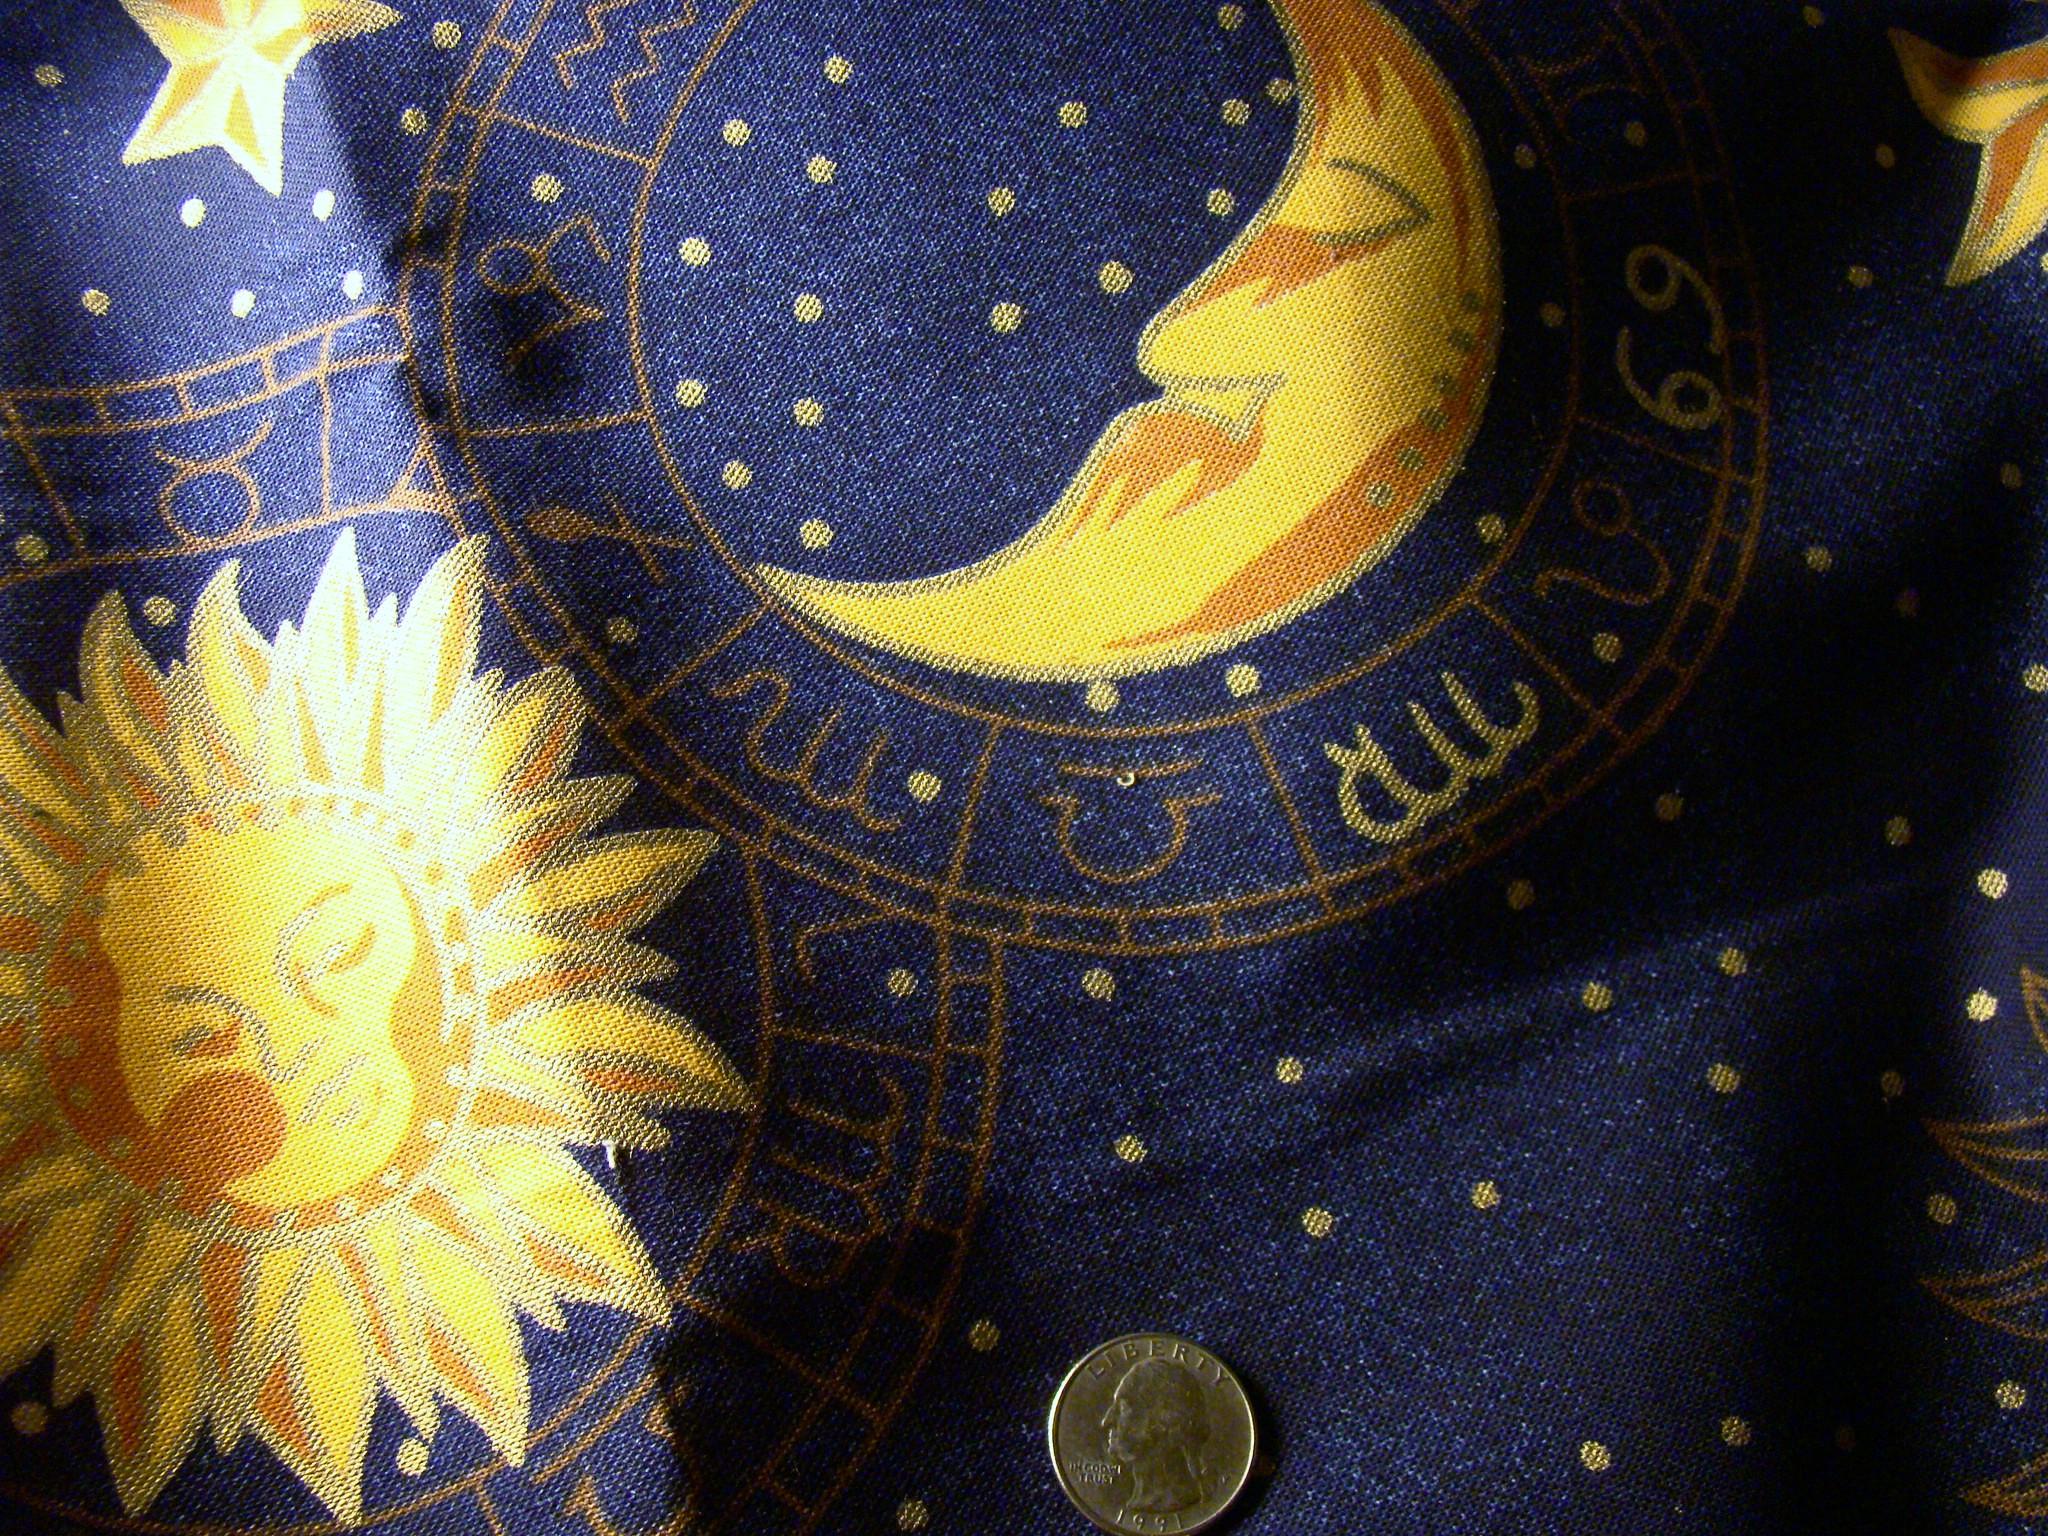 Sun Moon Stars Horoscope Drapery Prints Fabric # K-669